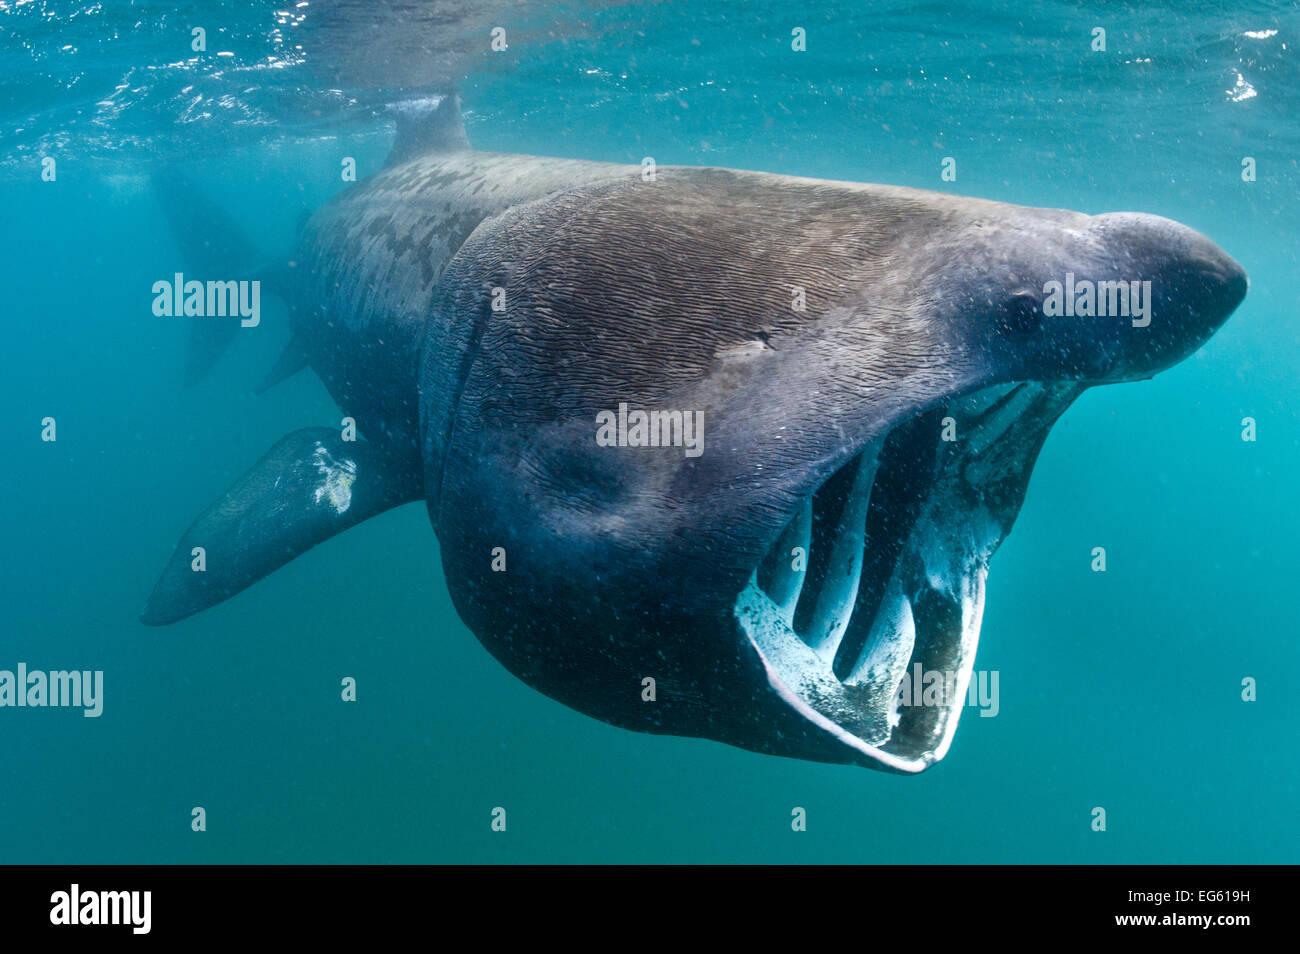 Basking shark (Cetorhinus maximus) feeding in open water, Cornwall, England, UK, June - Stock Image